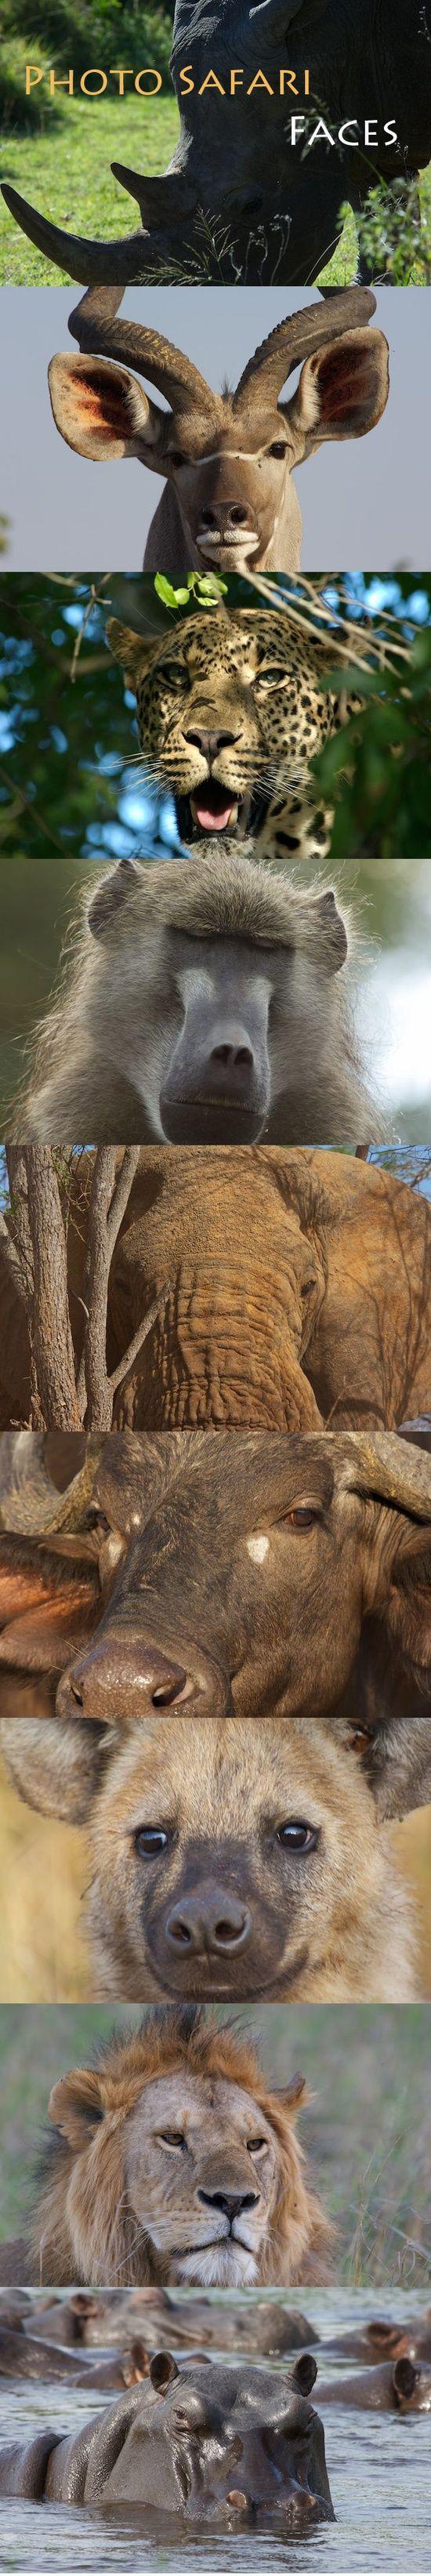 Wildlife photography courses in South Africa, Botswana, Namibia, Tanzania and Kenya.